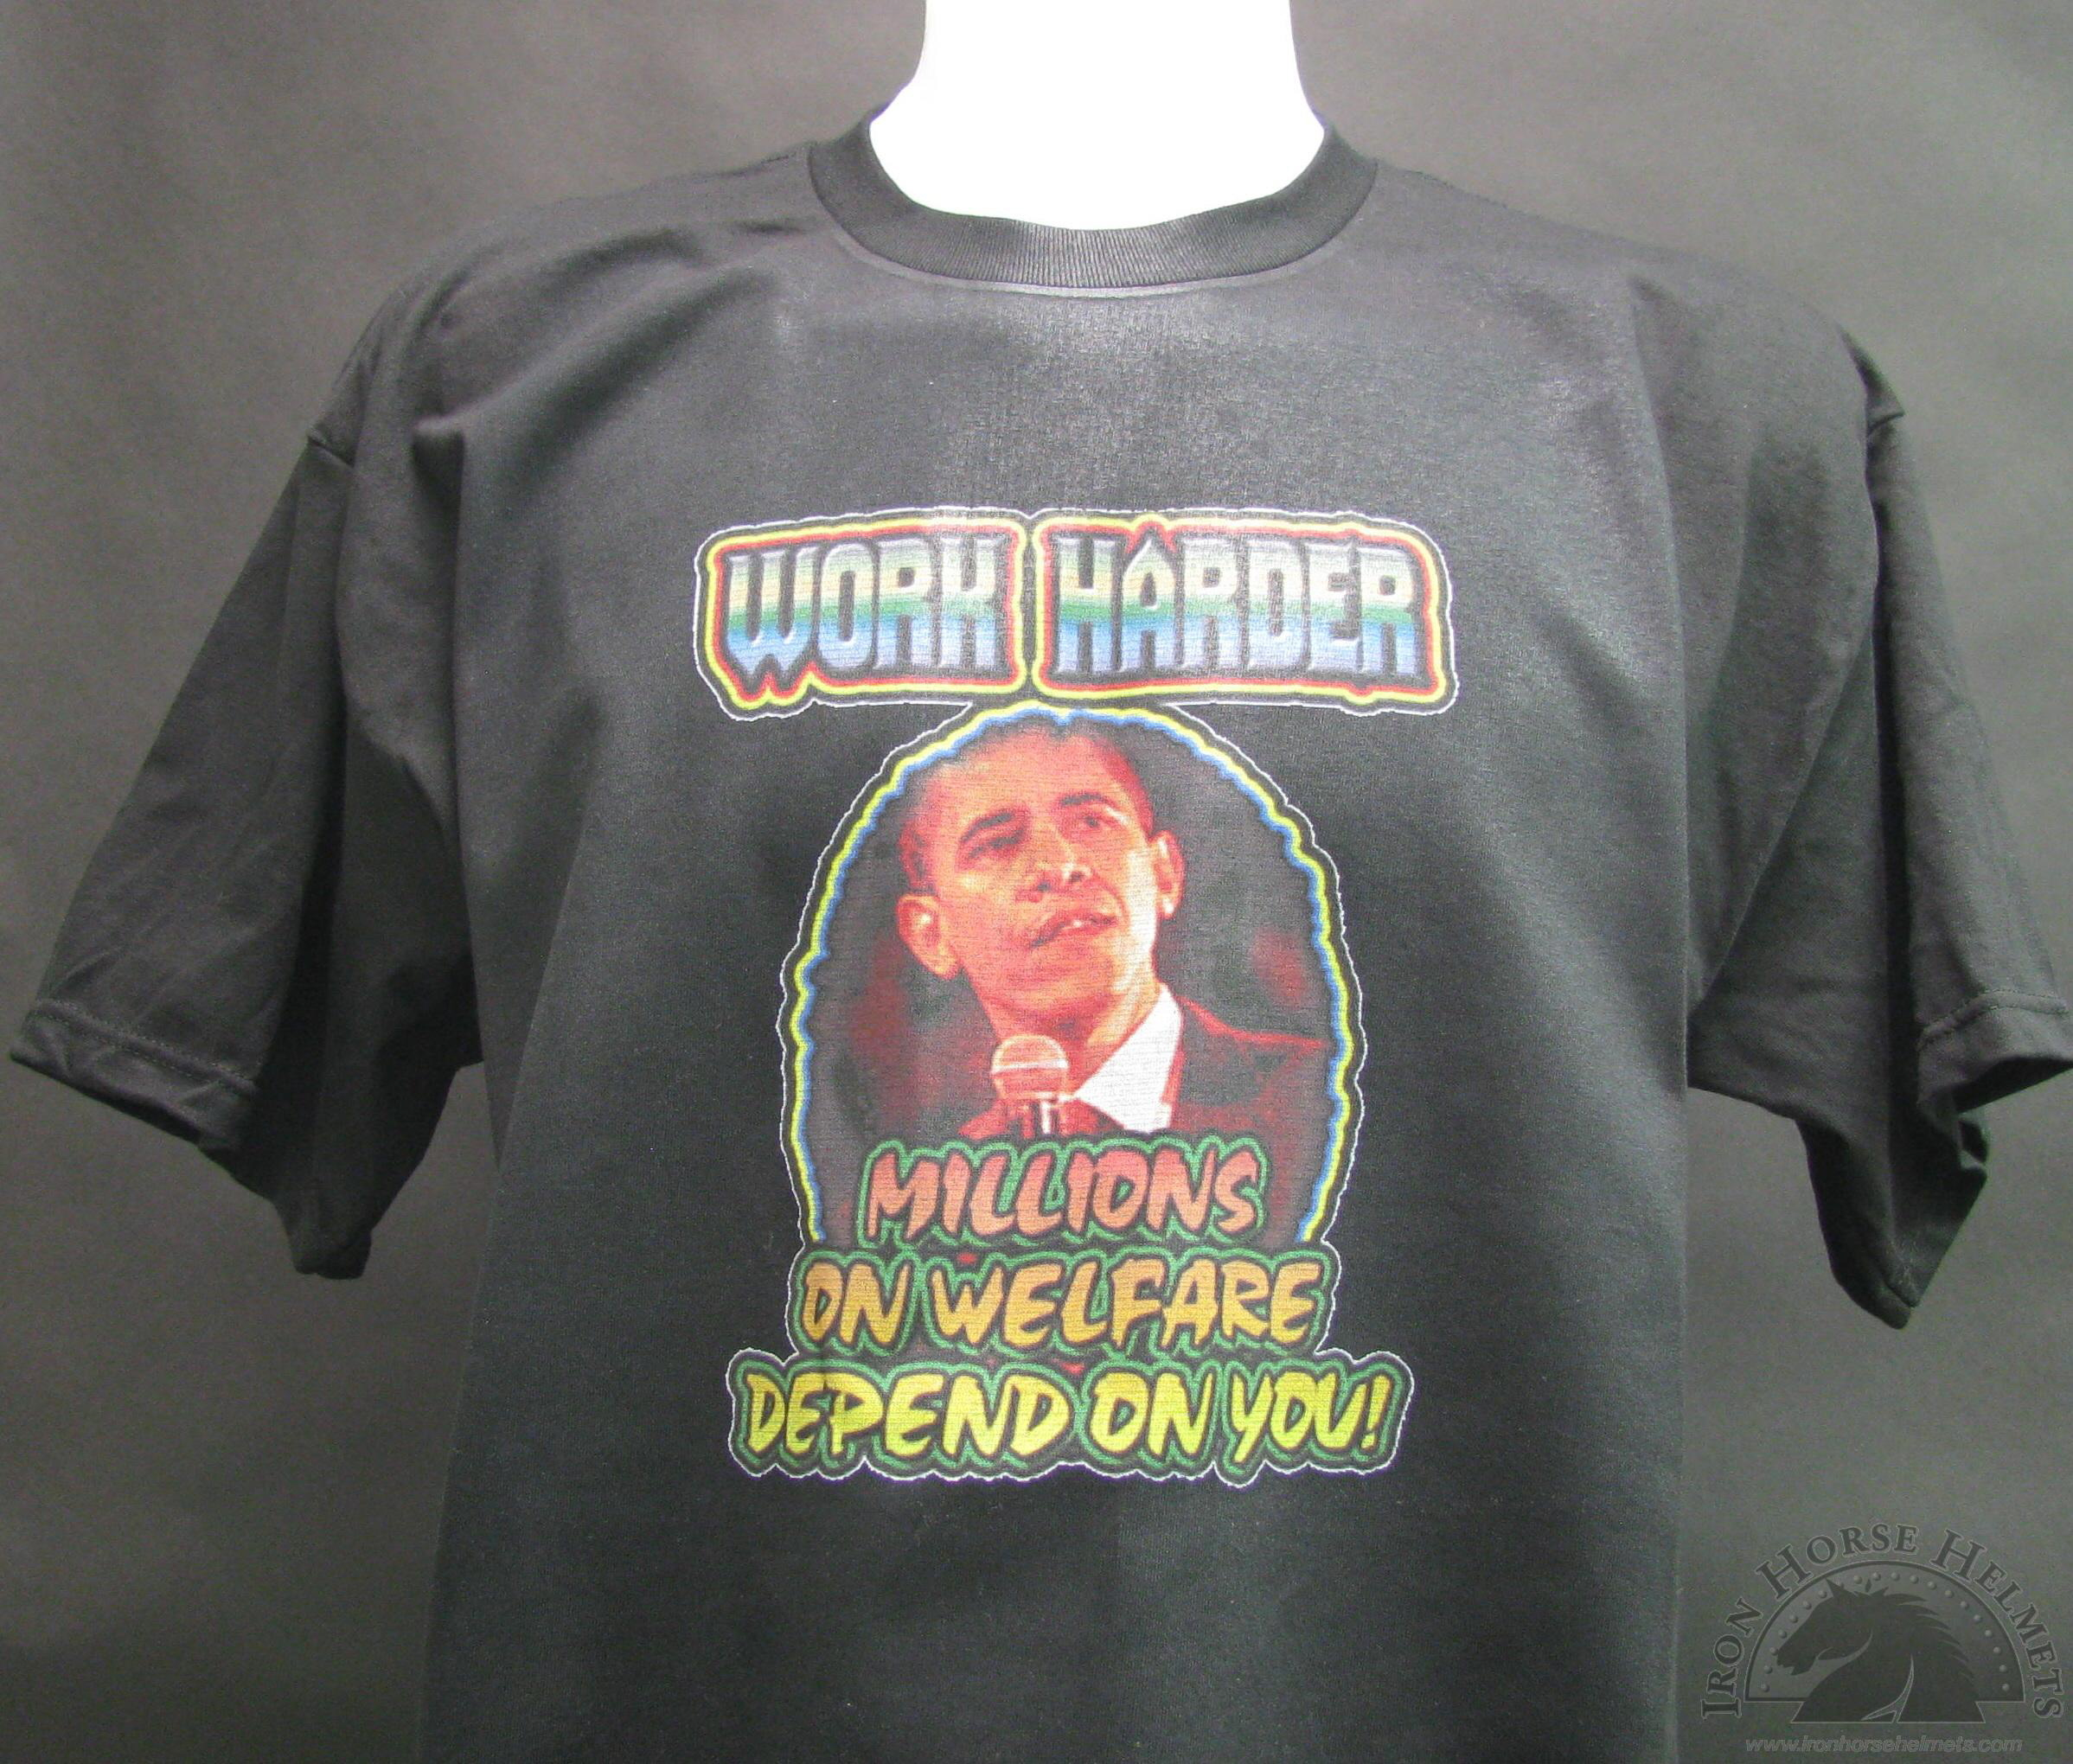 work-harder-millions-on-welfare-depend-on-you-shirt.jpg